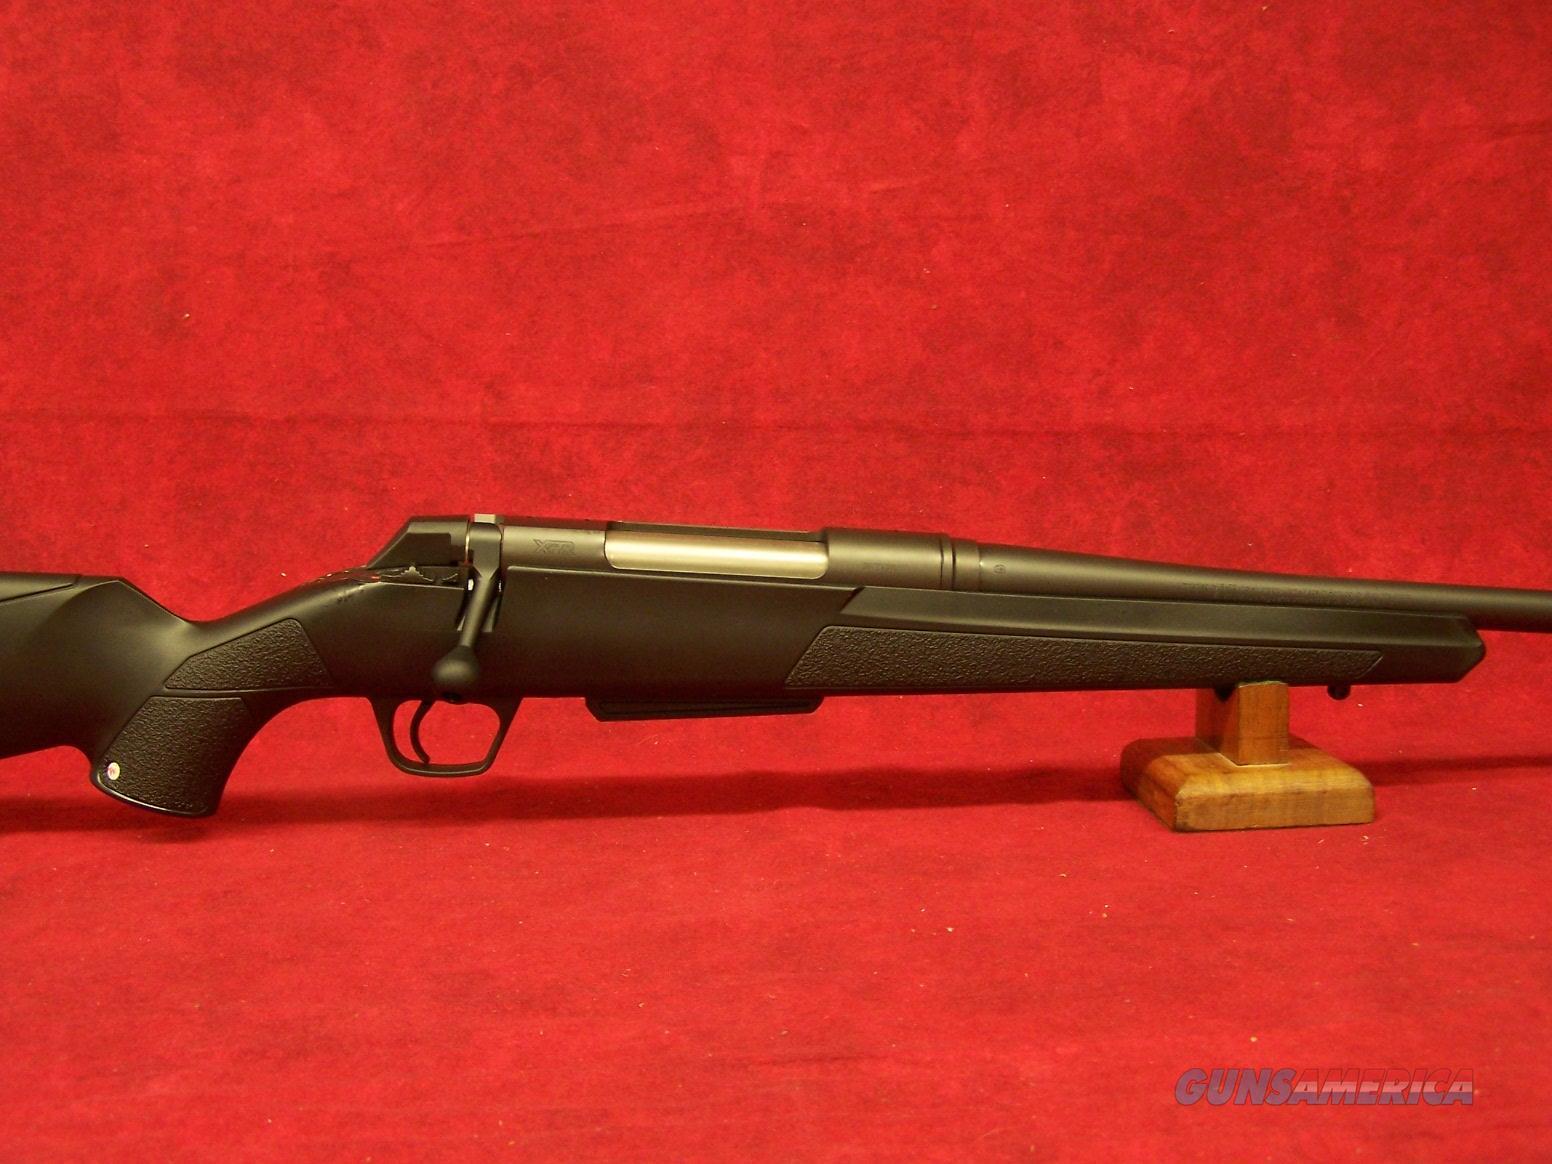 "Winchester XPR .270 Win 24"" (535700226)  Guns > Rifles > Winchester Rifles - Modern Bolt/Auto/Single > Other Bolt Action"